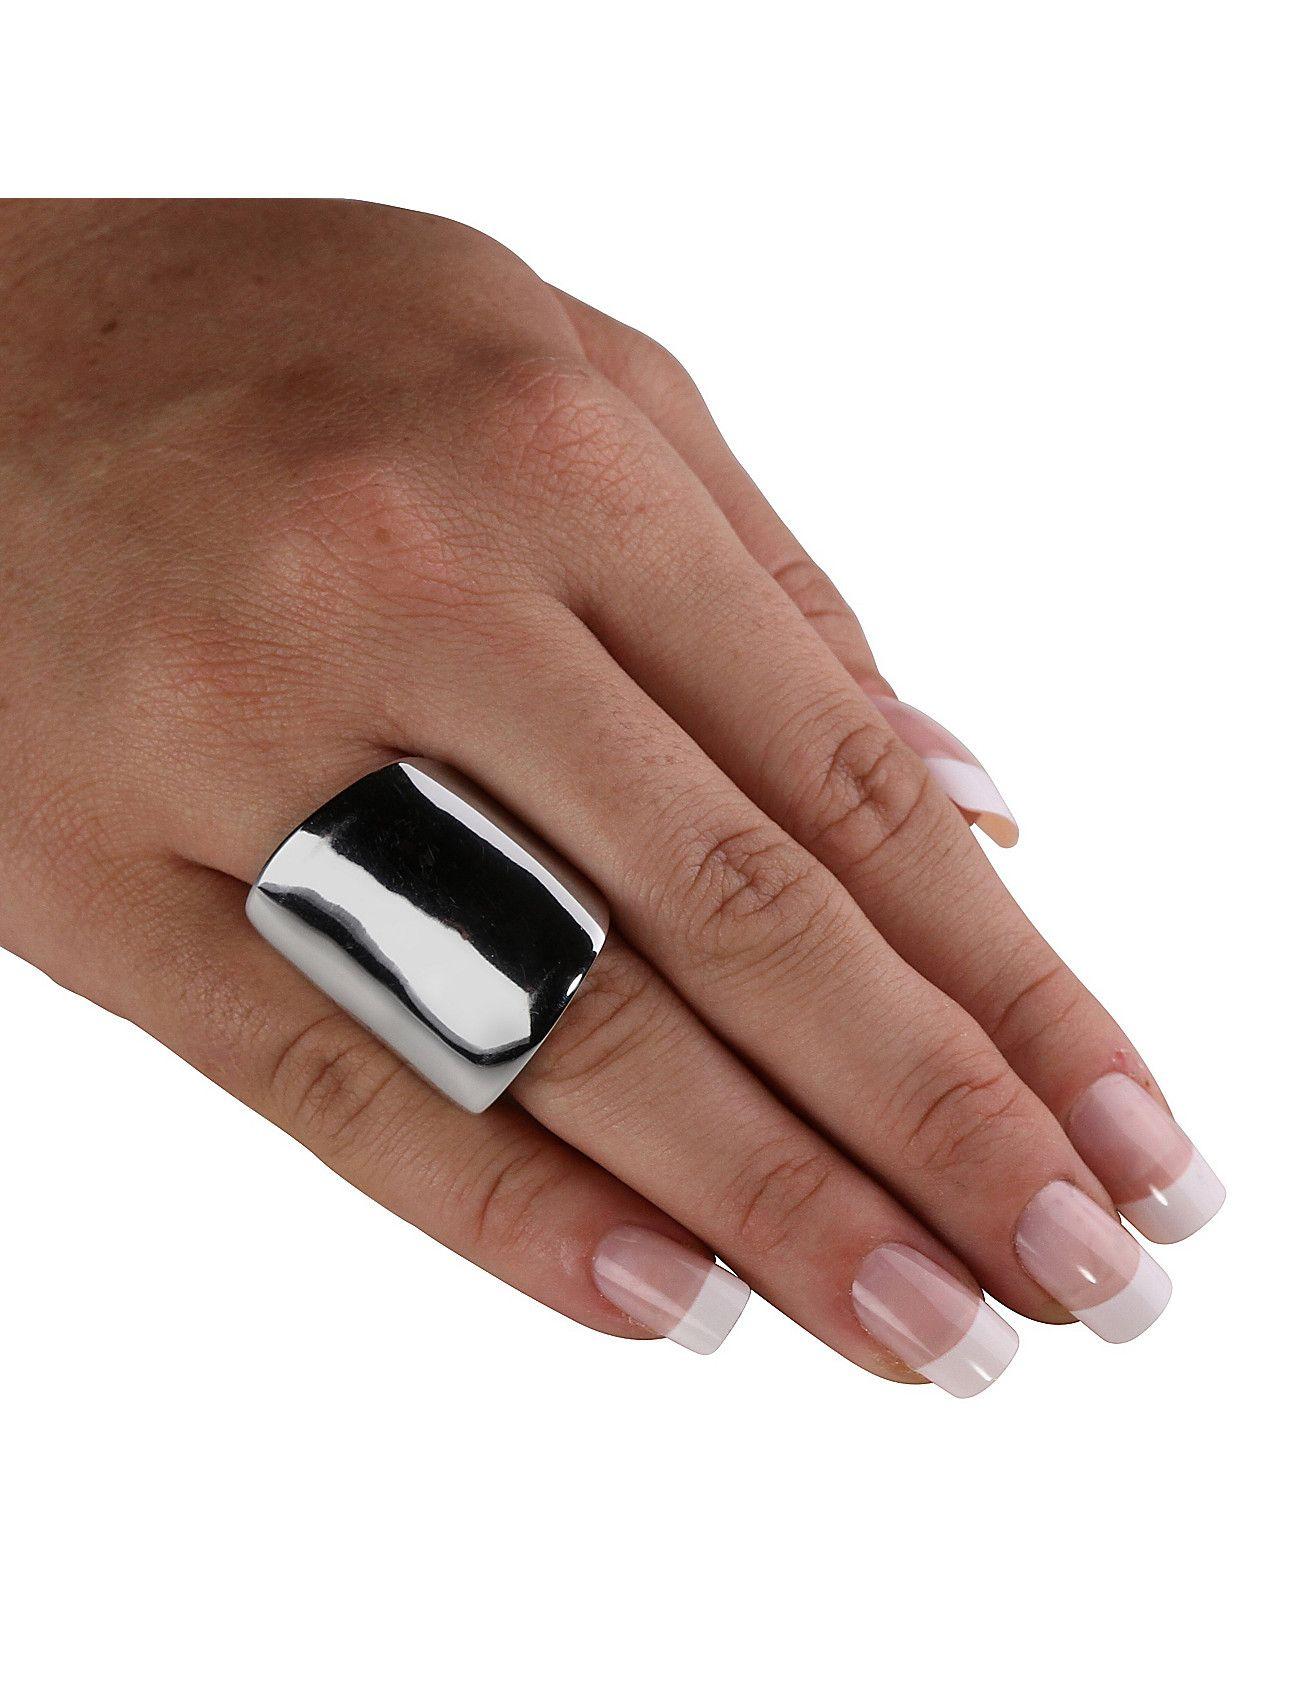 Silver Free-Form Square Ring   Lane Bryant